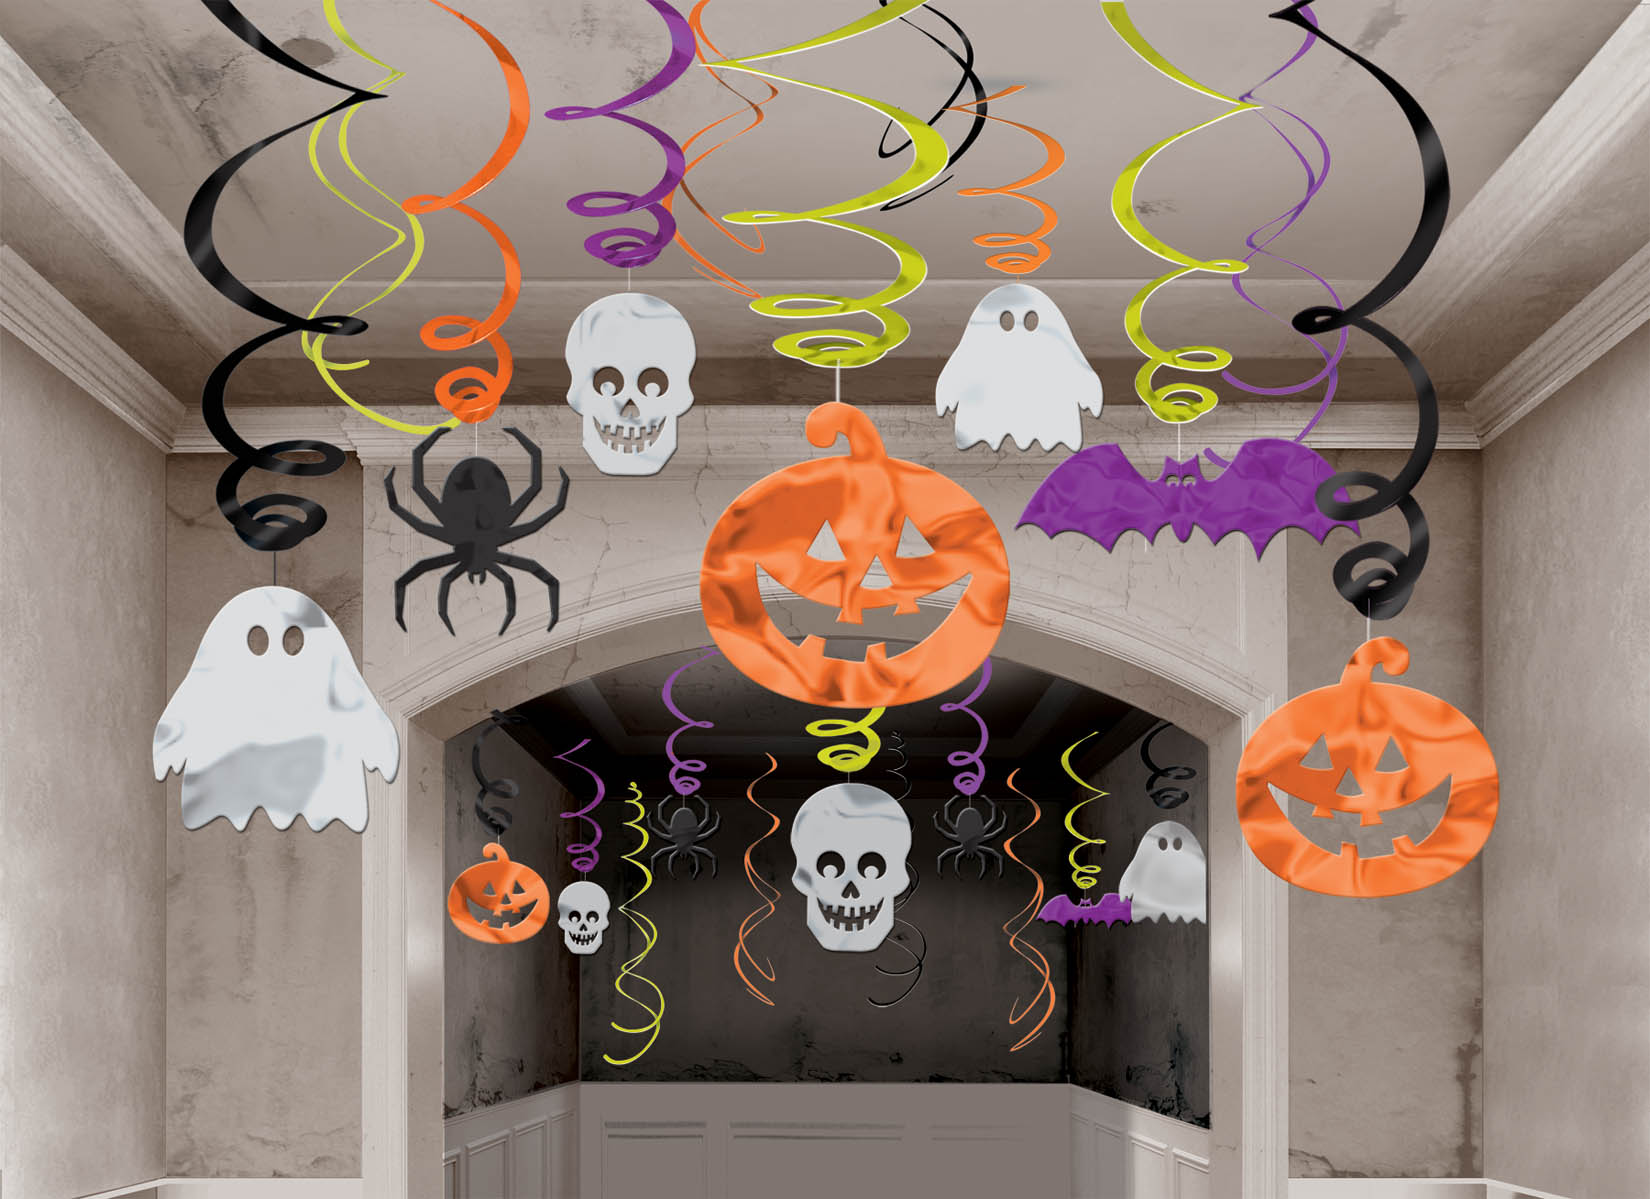 http://www.partycity.com.br/imagens/produtos/sazonal-halloween/679468_HFP11.jpg